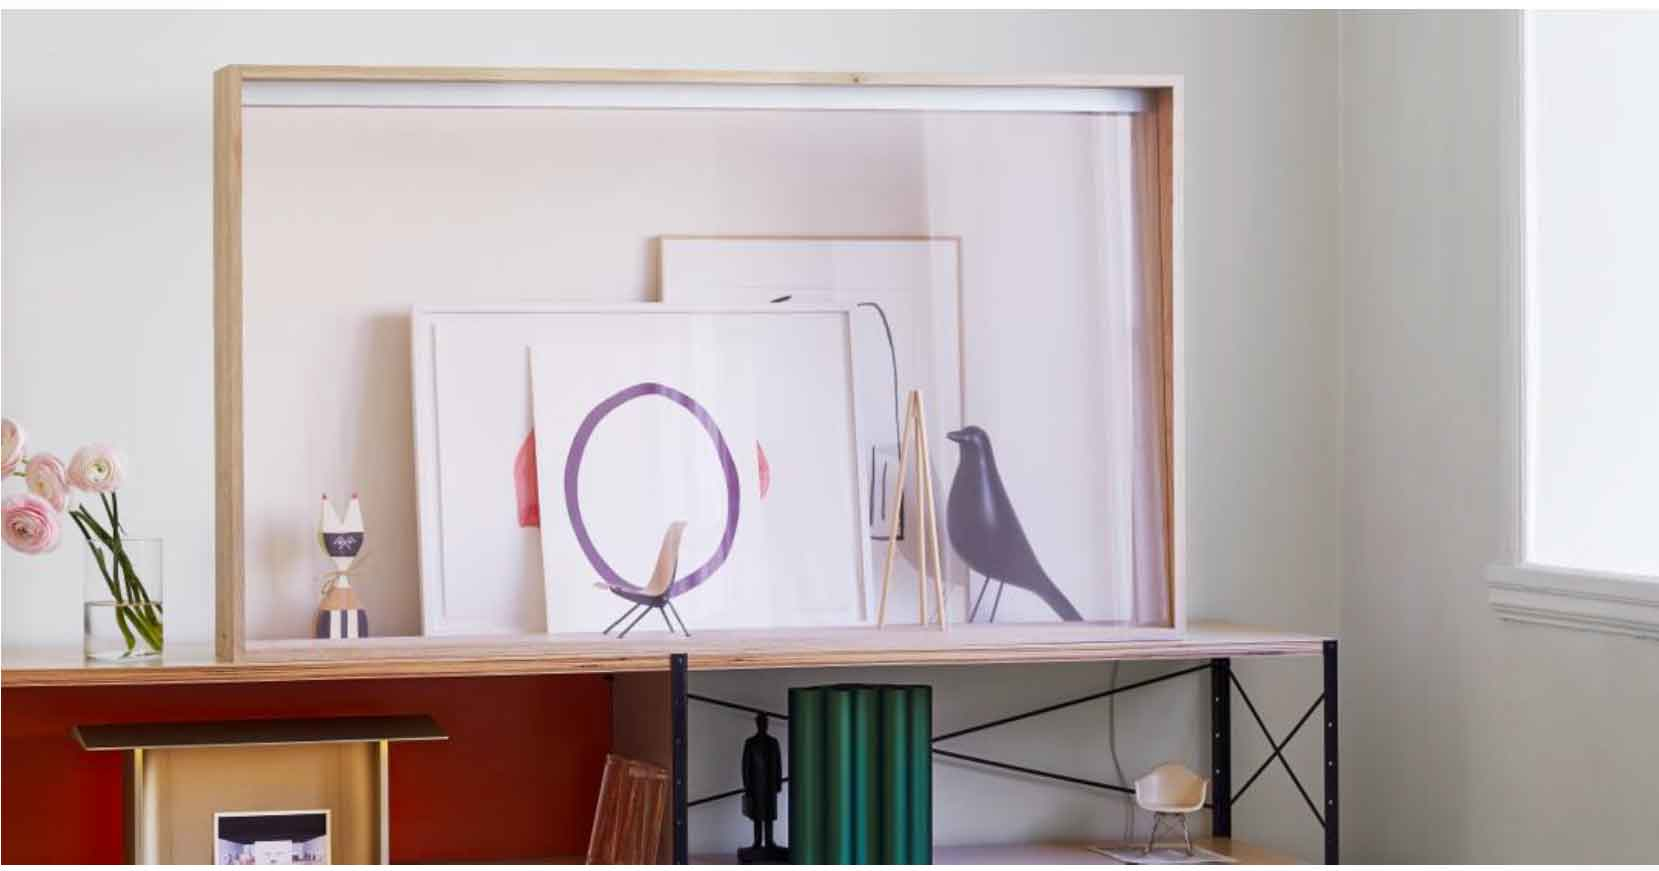 oncept di TV OLED trasparente